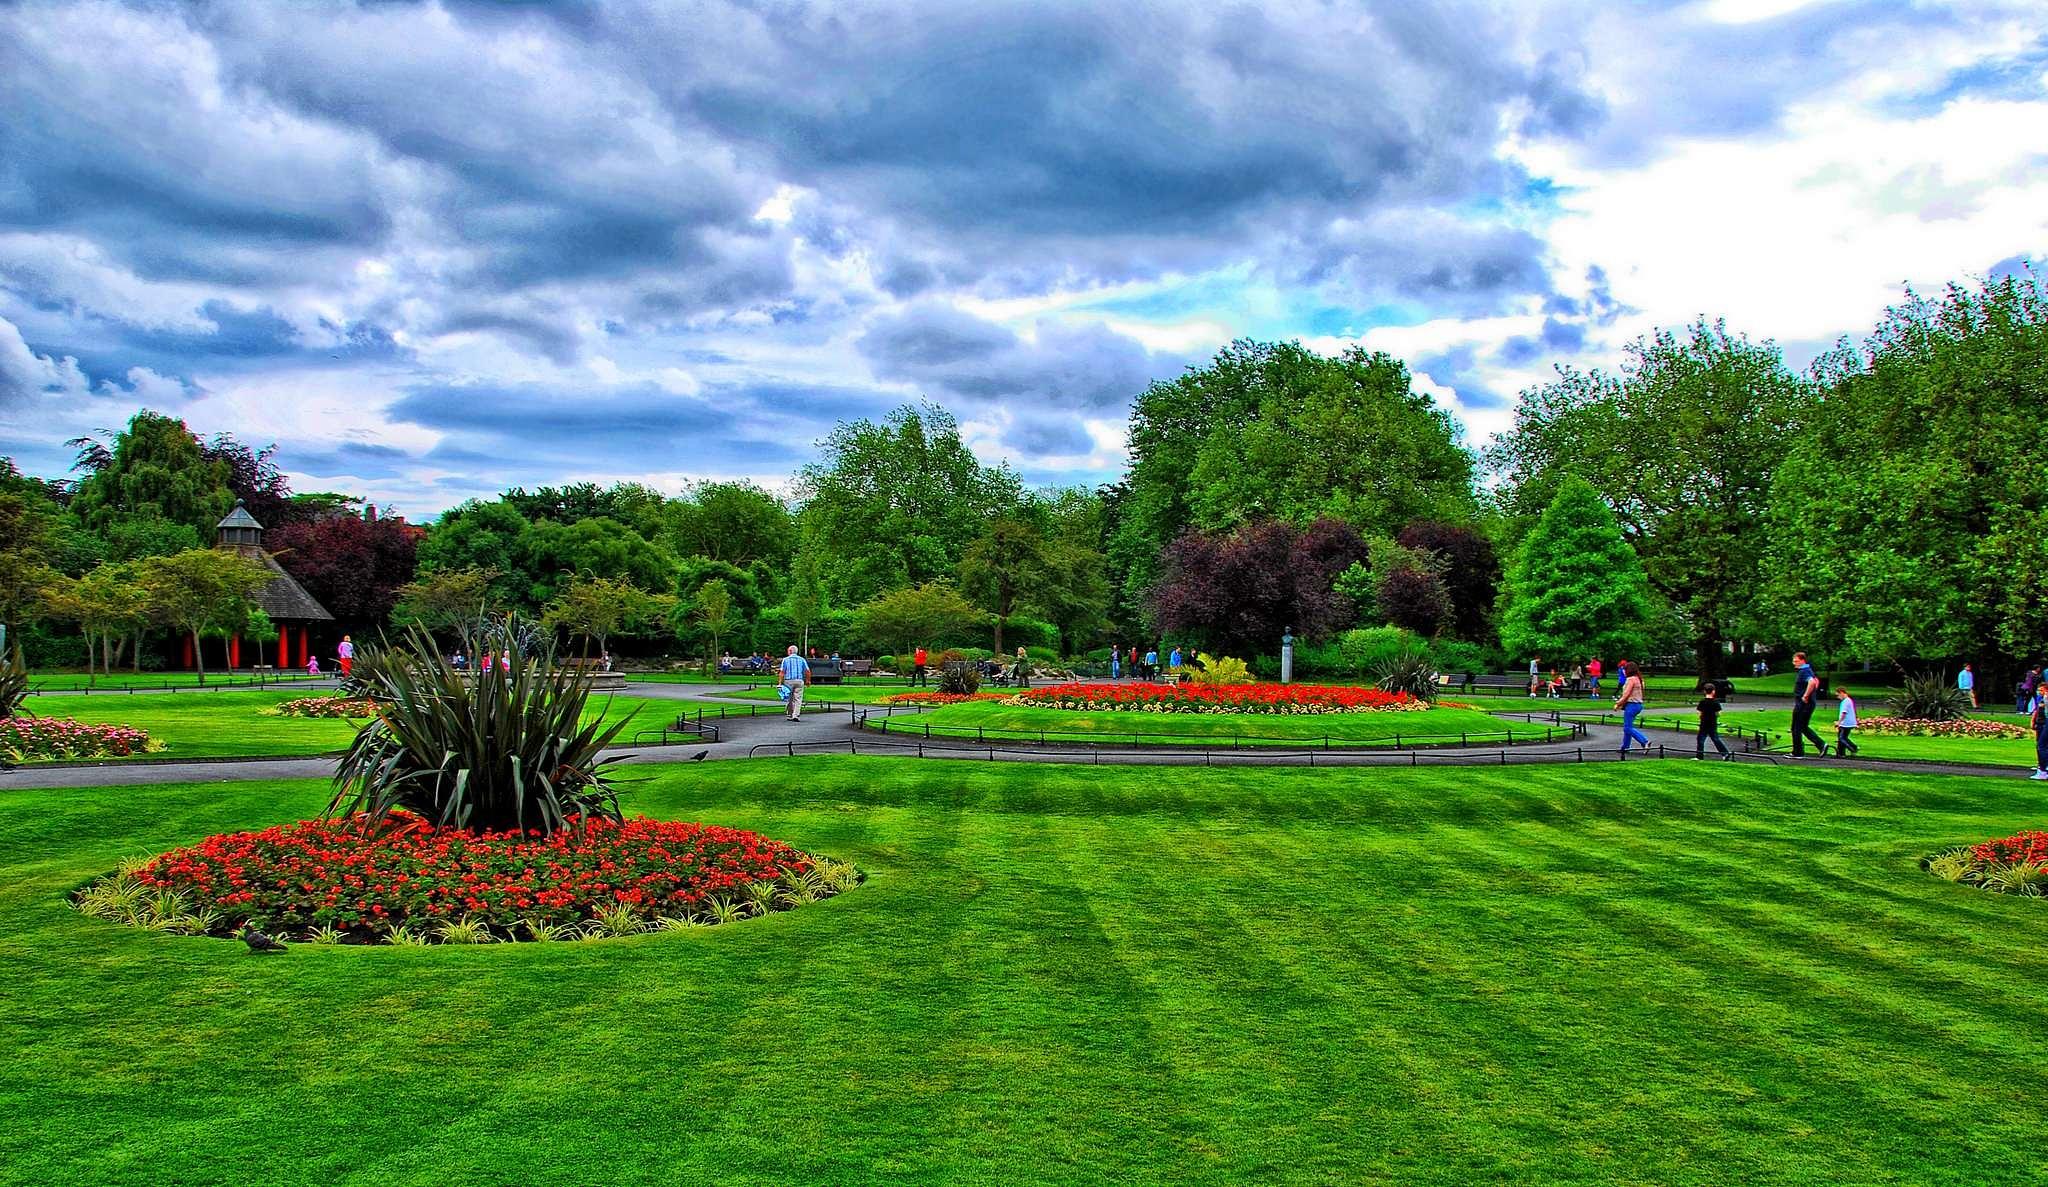 park by Vitalijus Ruth